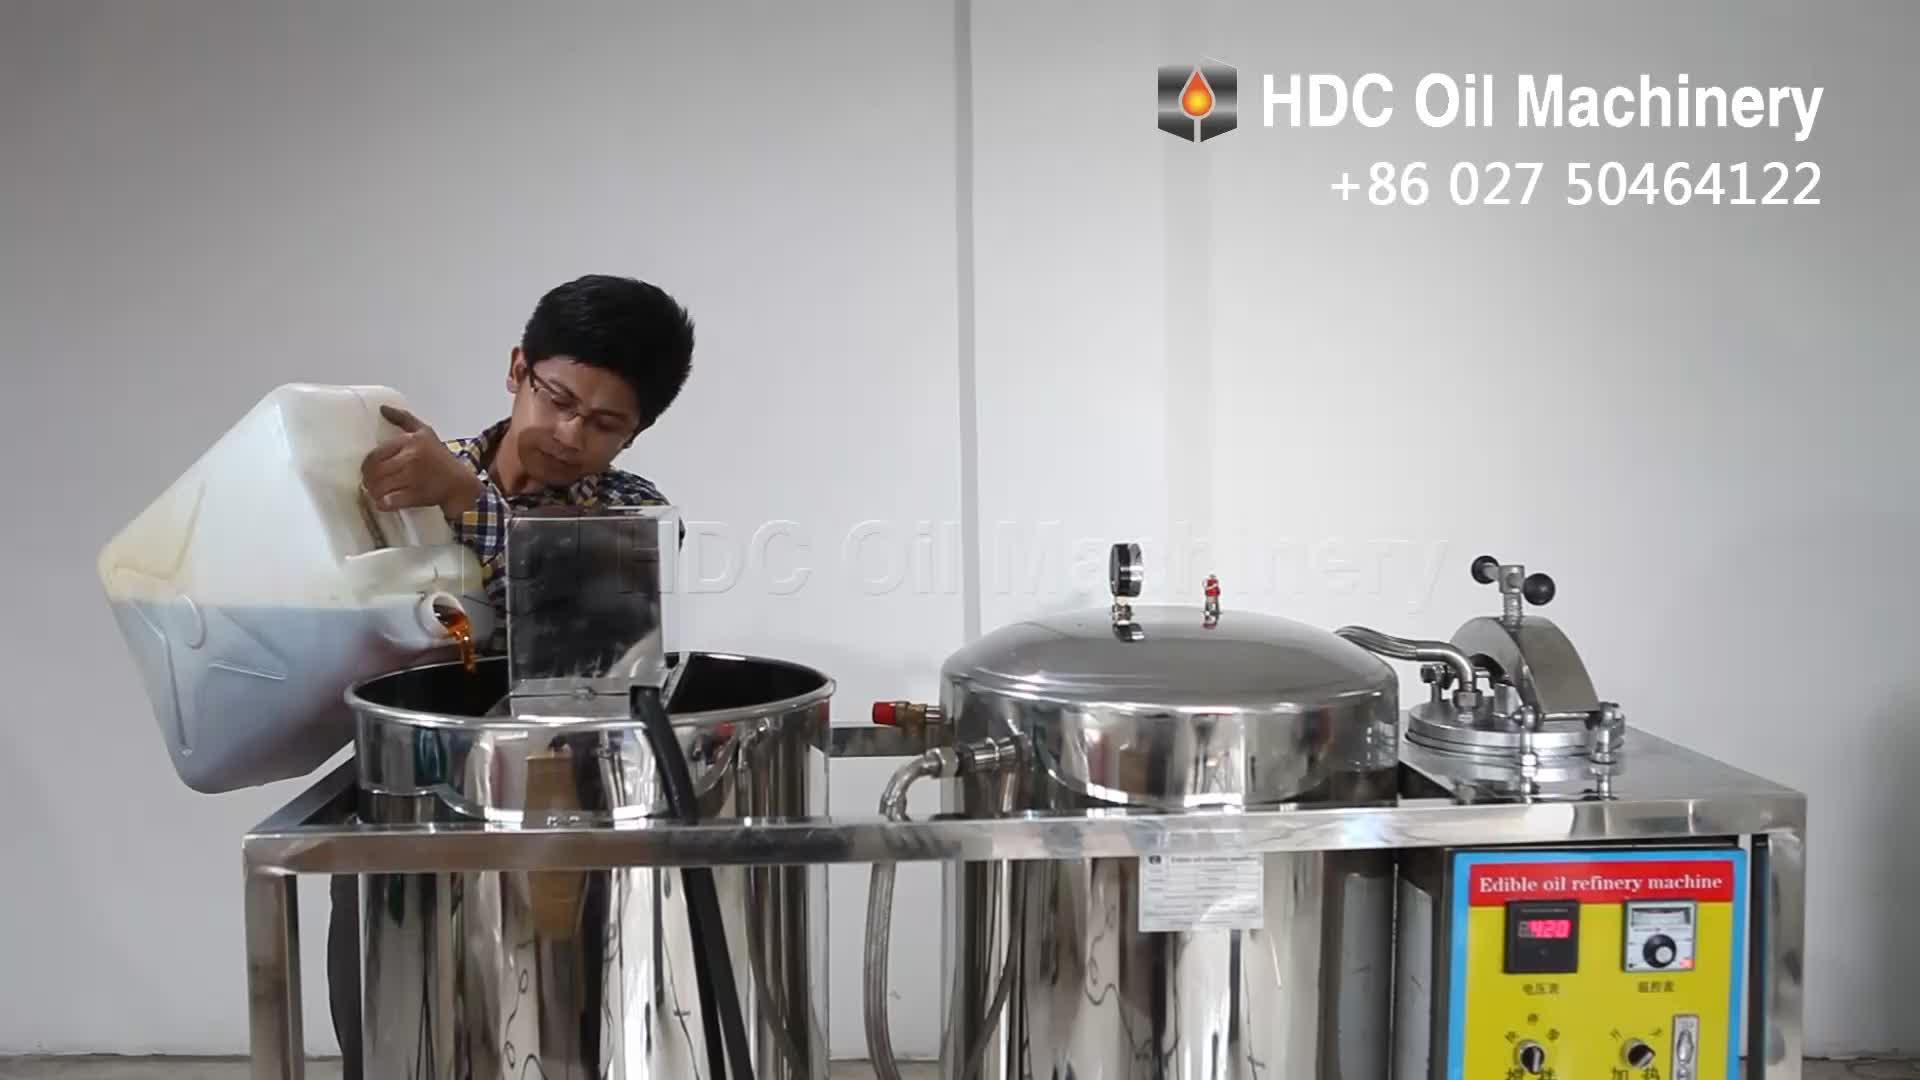 De pequeña escala de aceite comestible máquina de refinación de petróleo crudo máquina Refinería de mini aceite vegetal máquina refinería